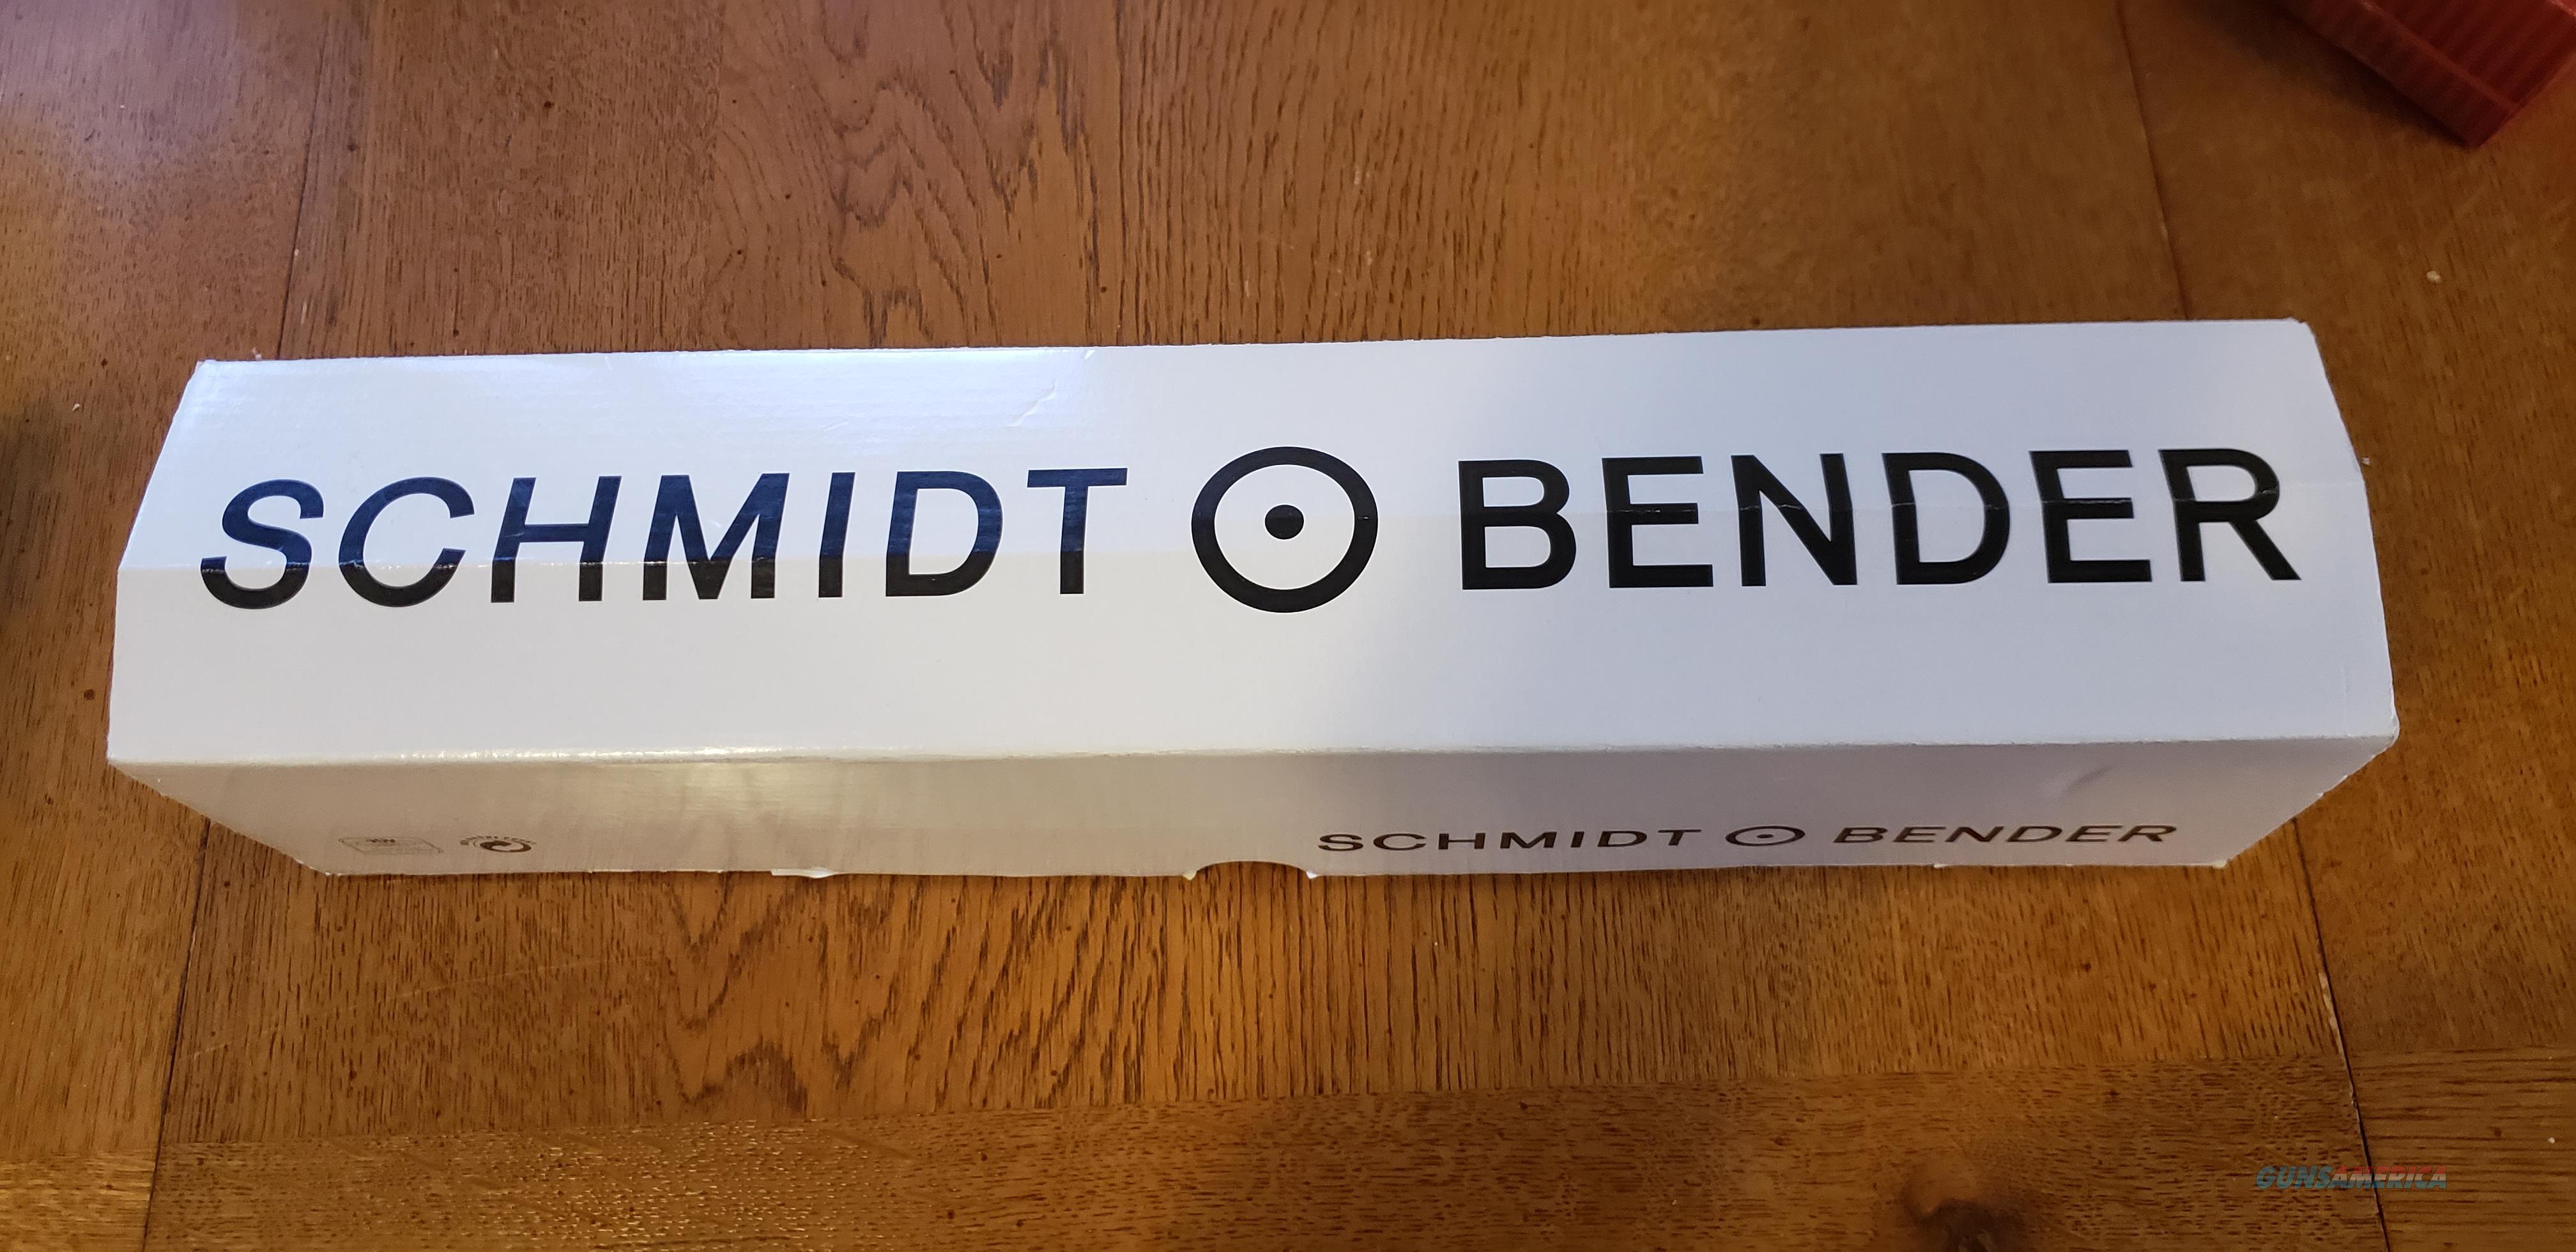 Schmidt and Bender 1.5-6 x 42 Zenith scope with Sako rings  Non-Guns > Scopes/Mounts/Rings & Optics > Rifle Scopes > Variable Focal Length